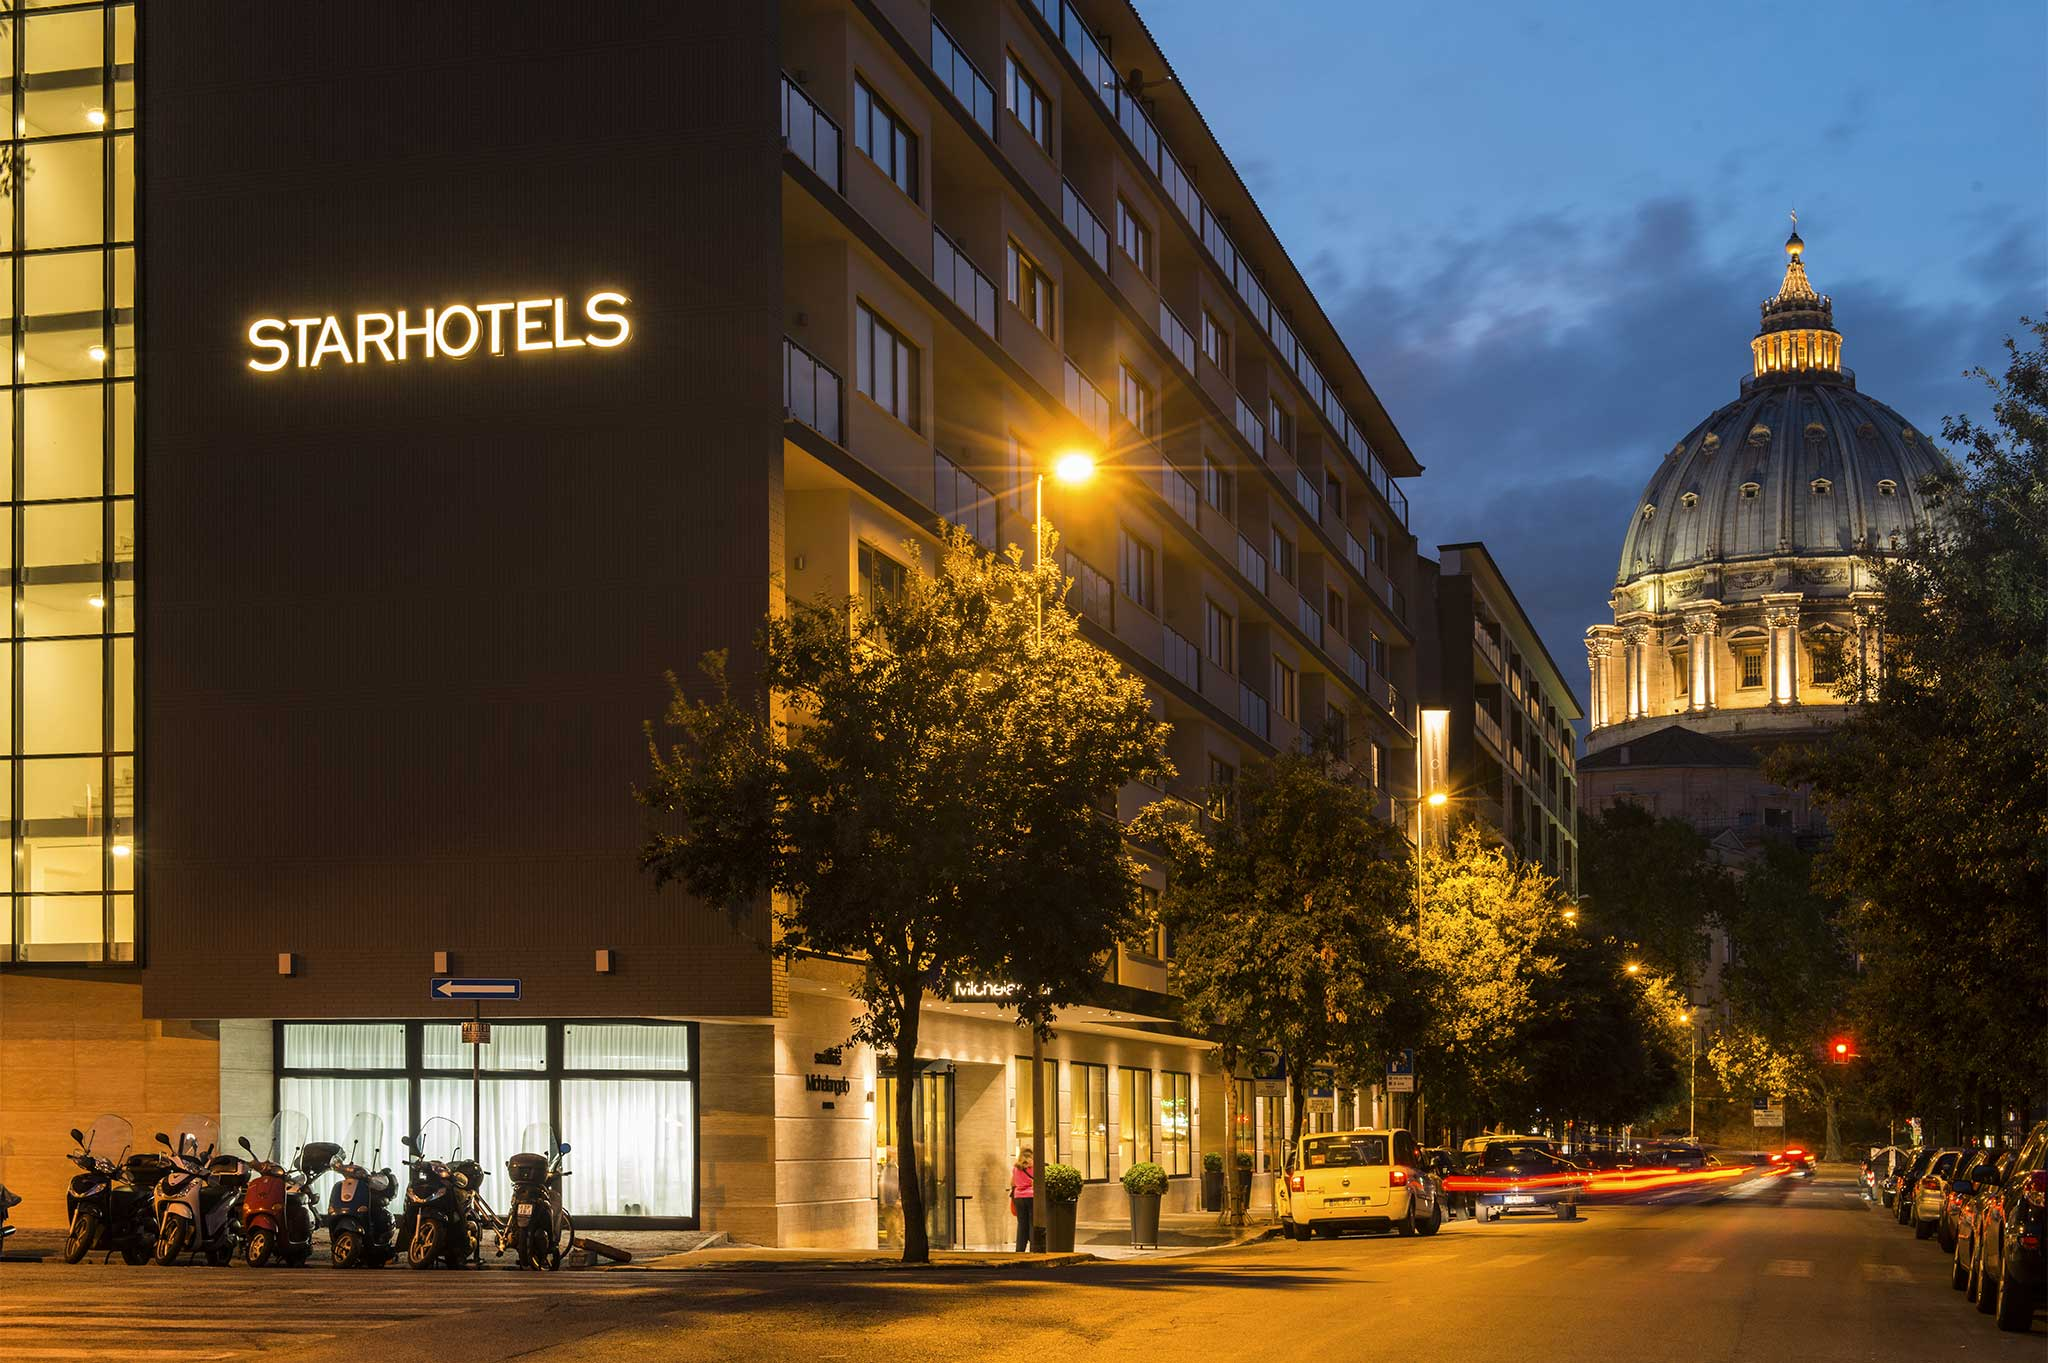 L'Hotel Michelangelo di Roma / Starhotels